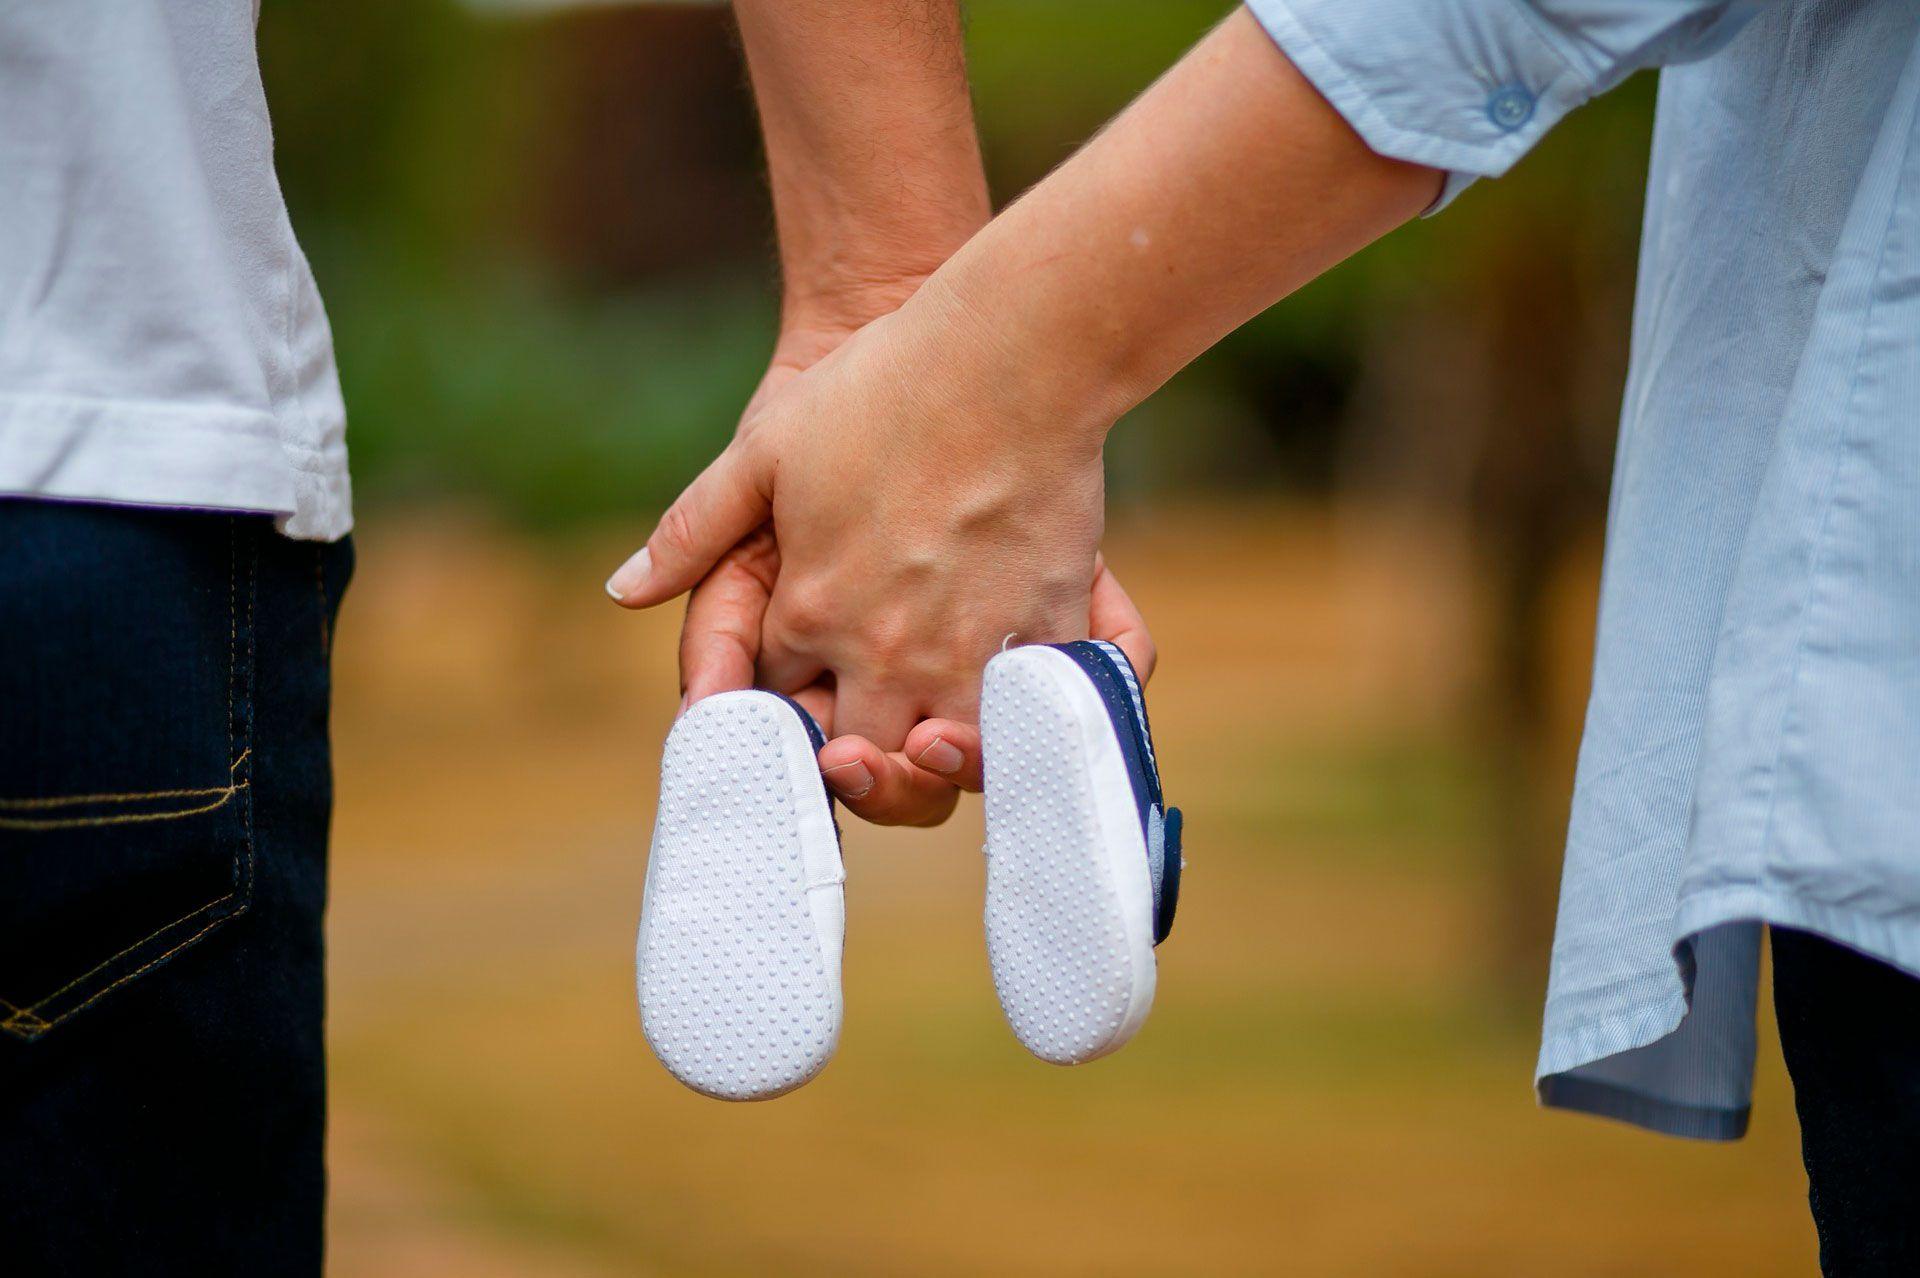 Maternidad, padres, familia, embarazo